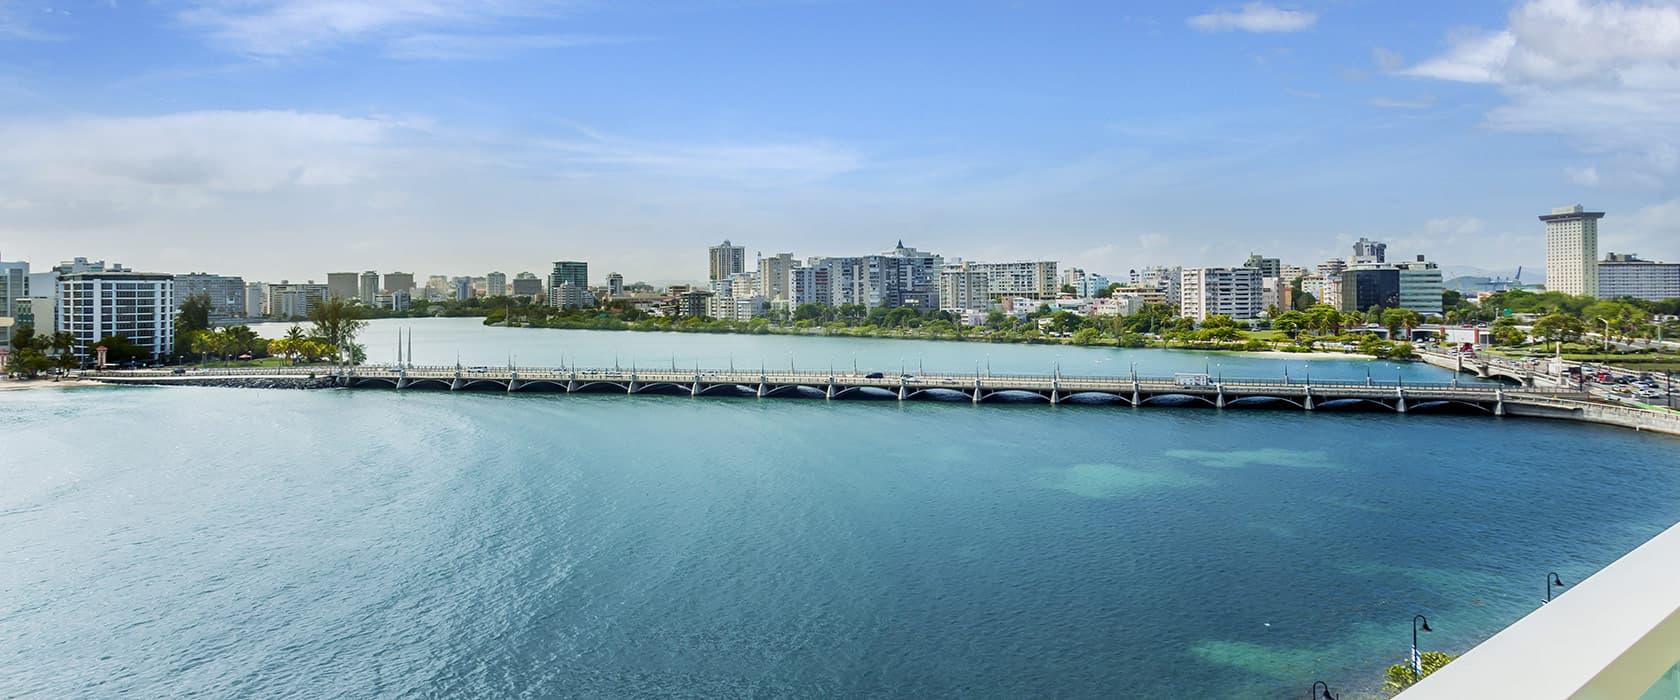 Condado Lagoon Villas At Caribe Hilton Hotel San Juan